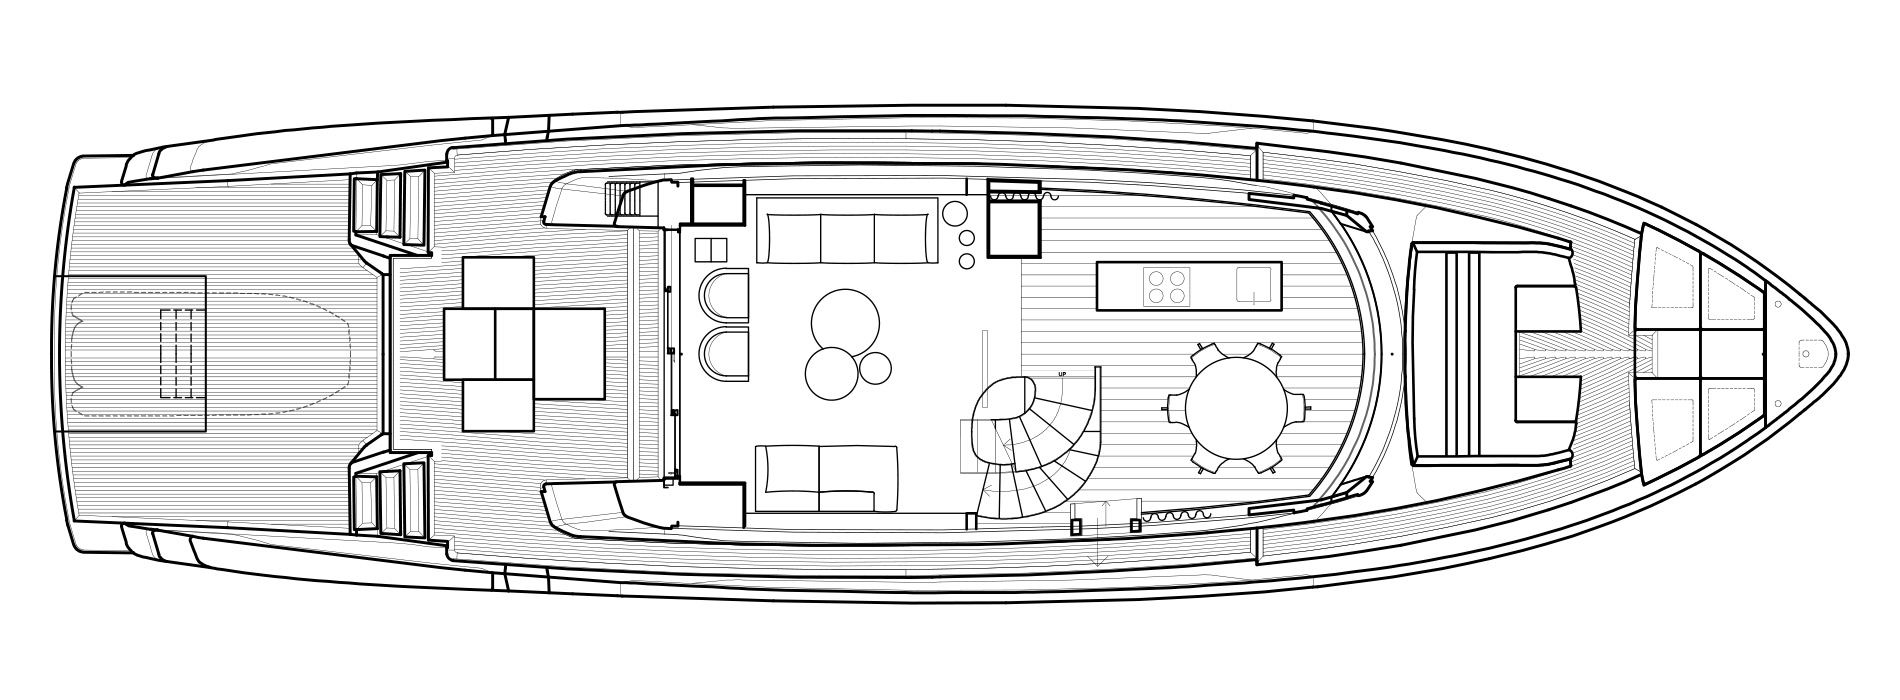 Sanlorenzo Yachts SX76 Hauptdeck Versione Lissoni